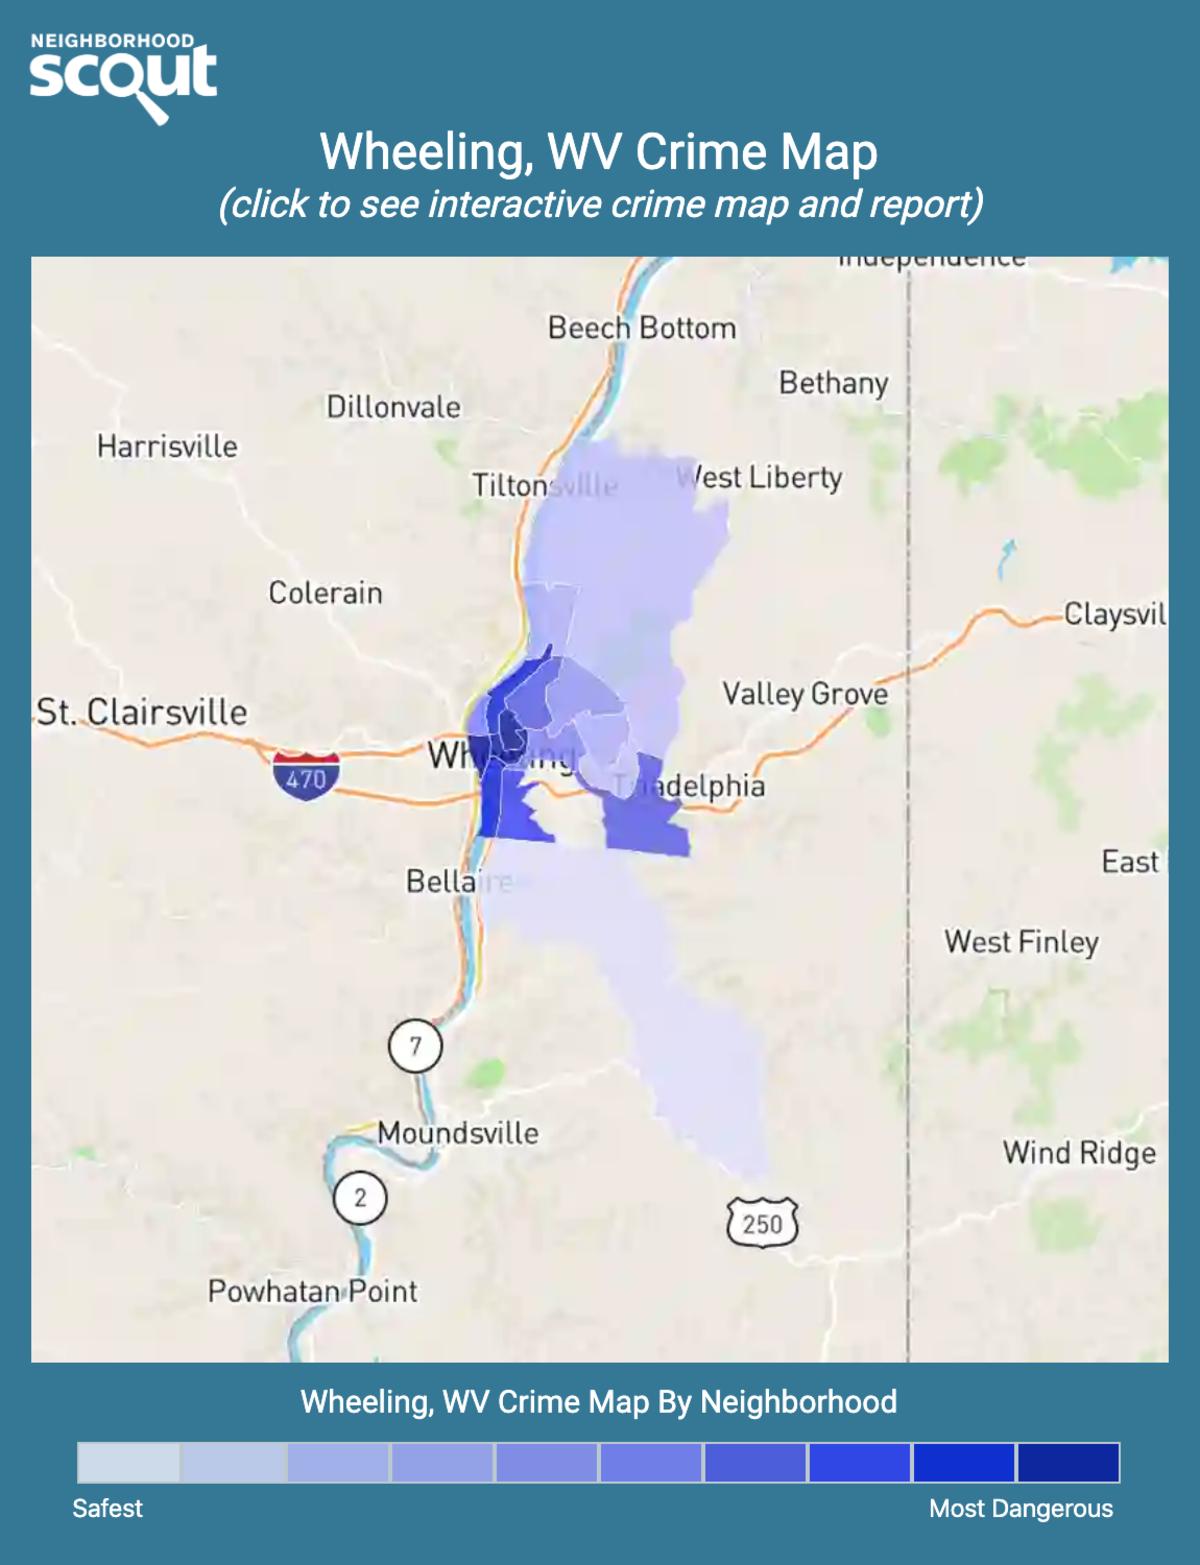 Wheeling, West Virginia crime map